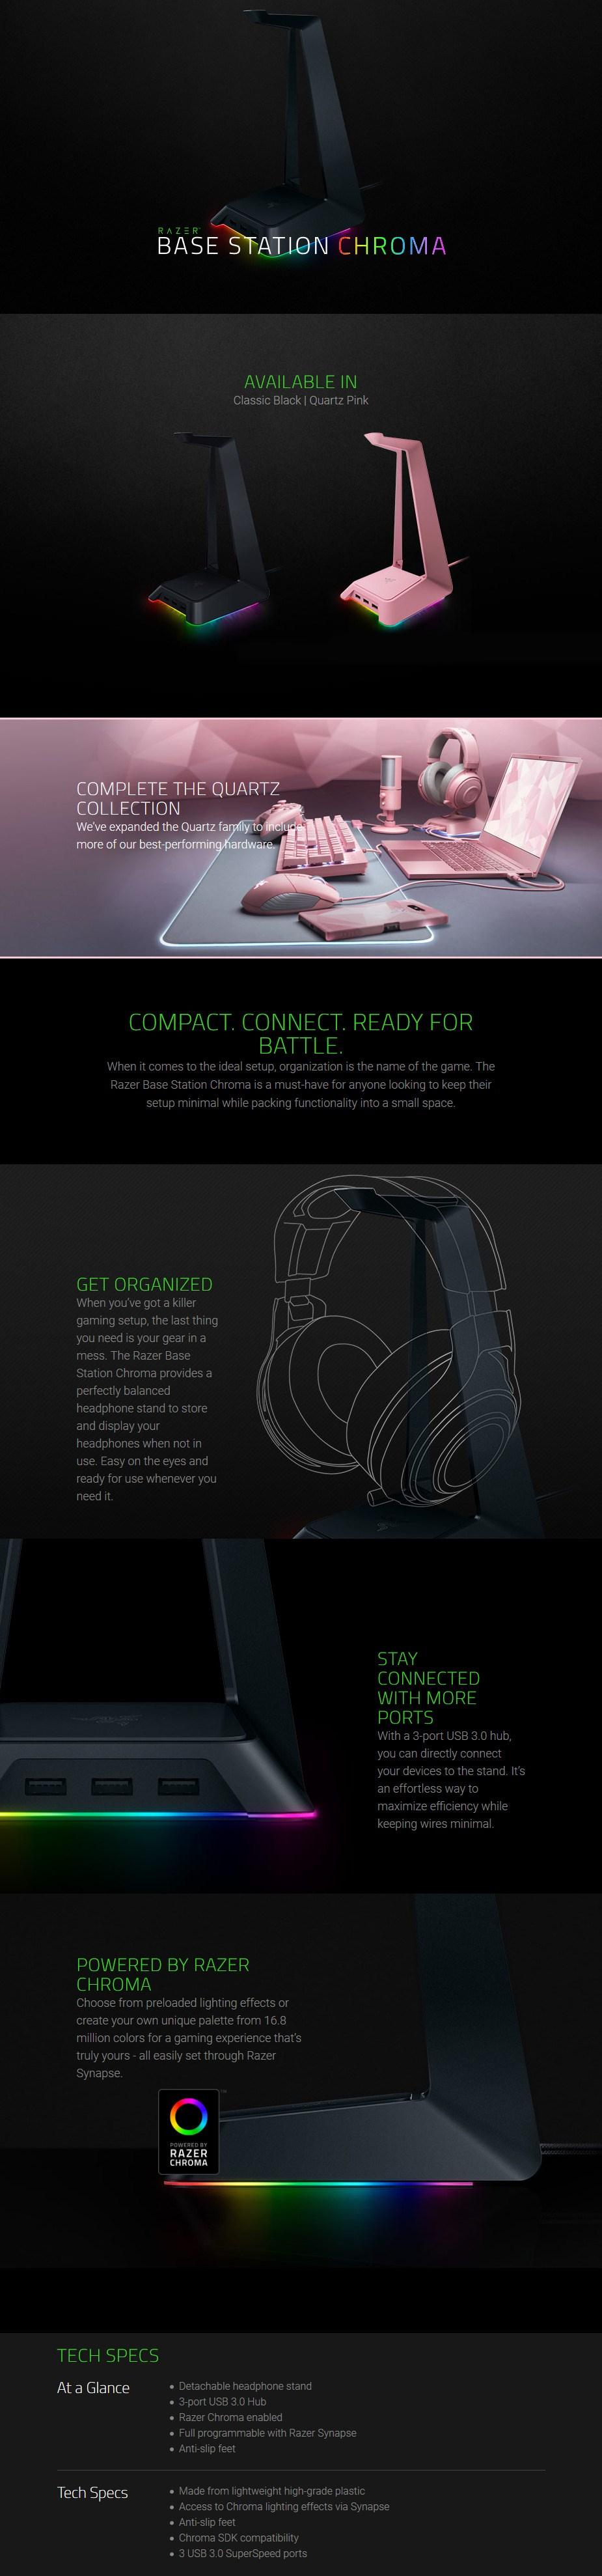 Razer Chroma Headset Stand & Base Station - Quartz Edition - RC21